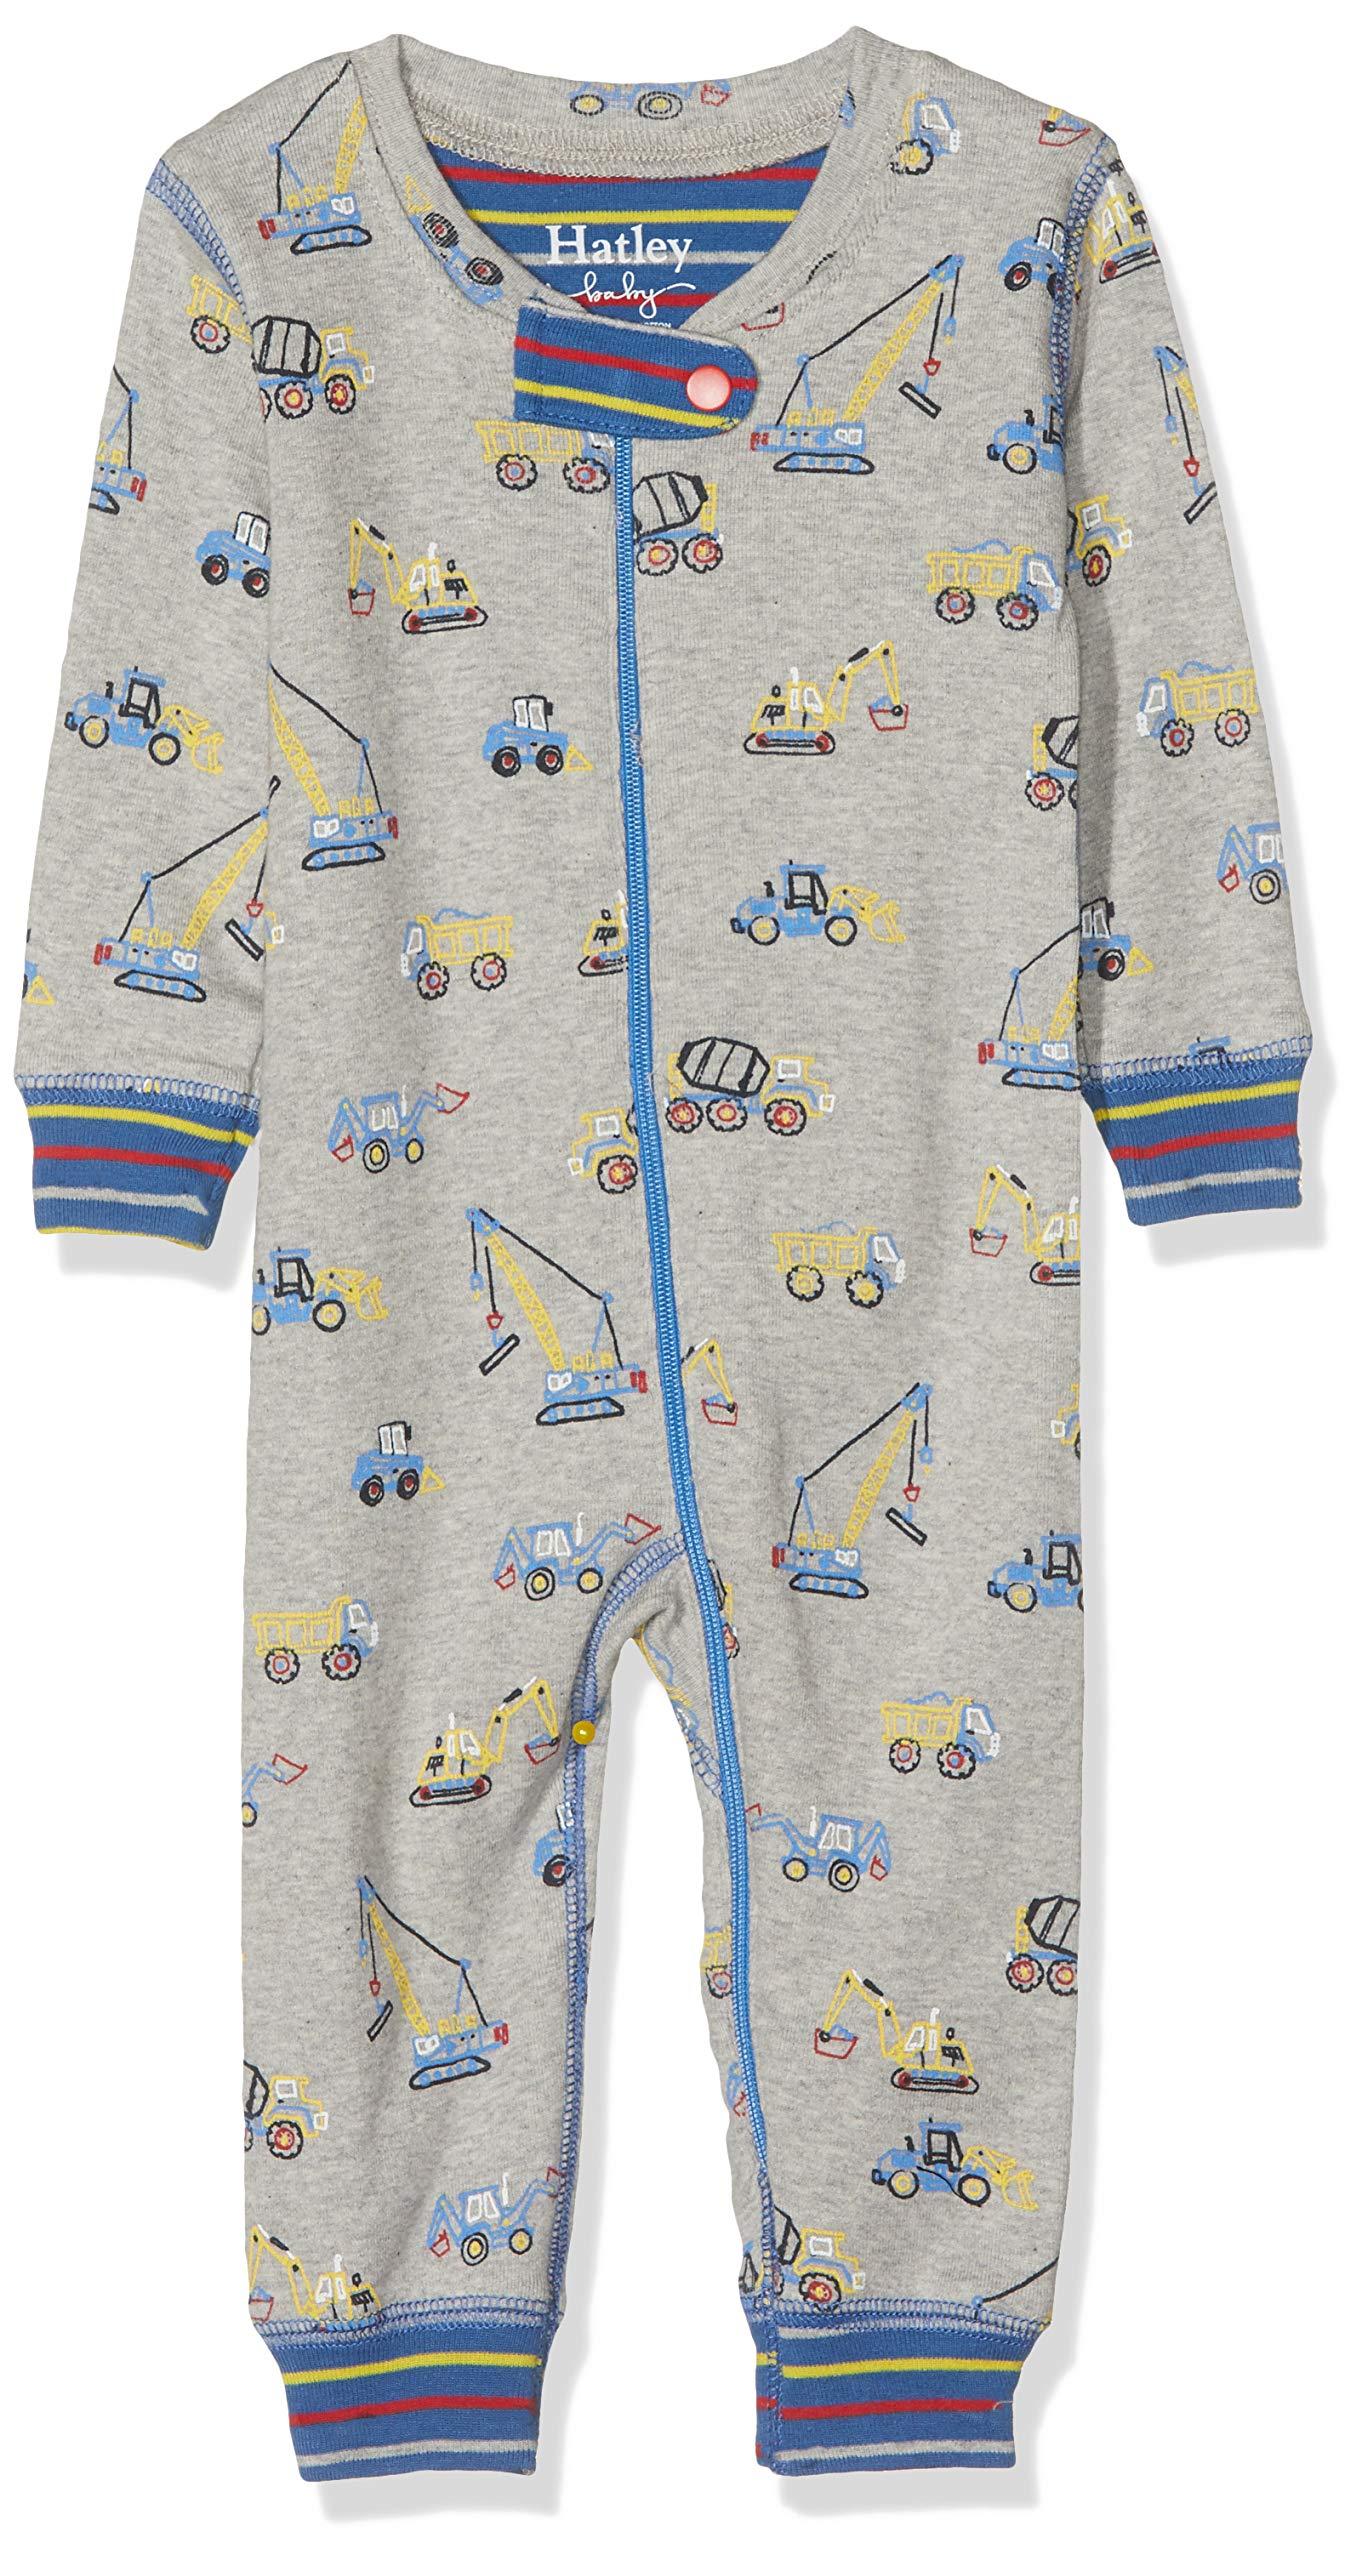 Hatley Organic Cotton Sleepsuit Pelele para Dormir para Bebés 1